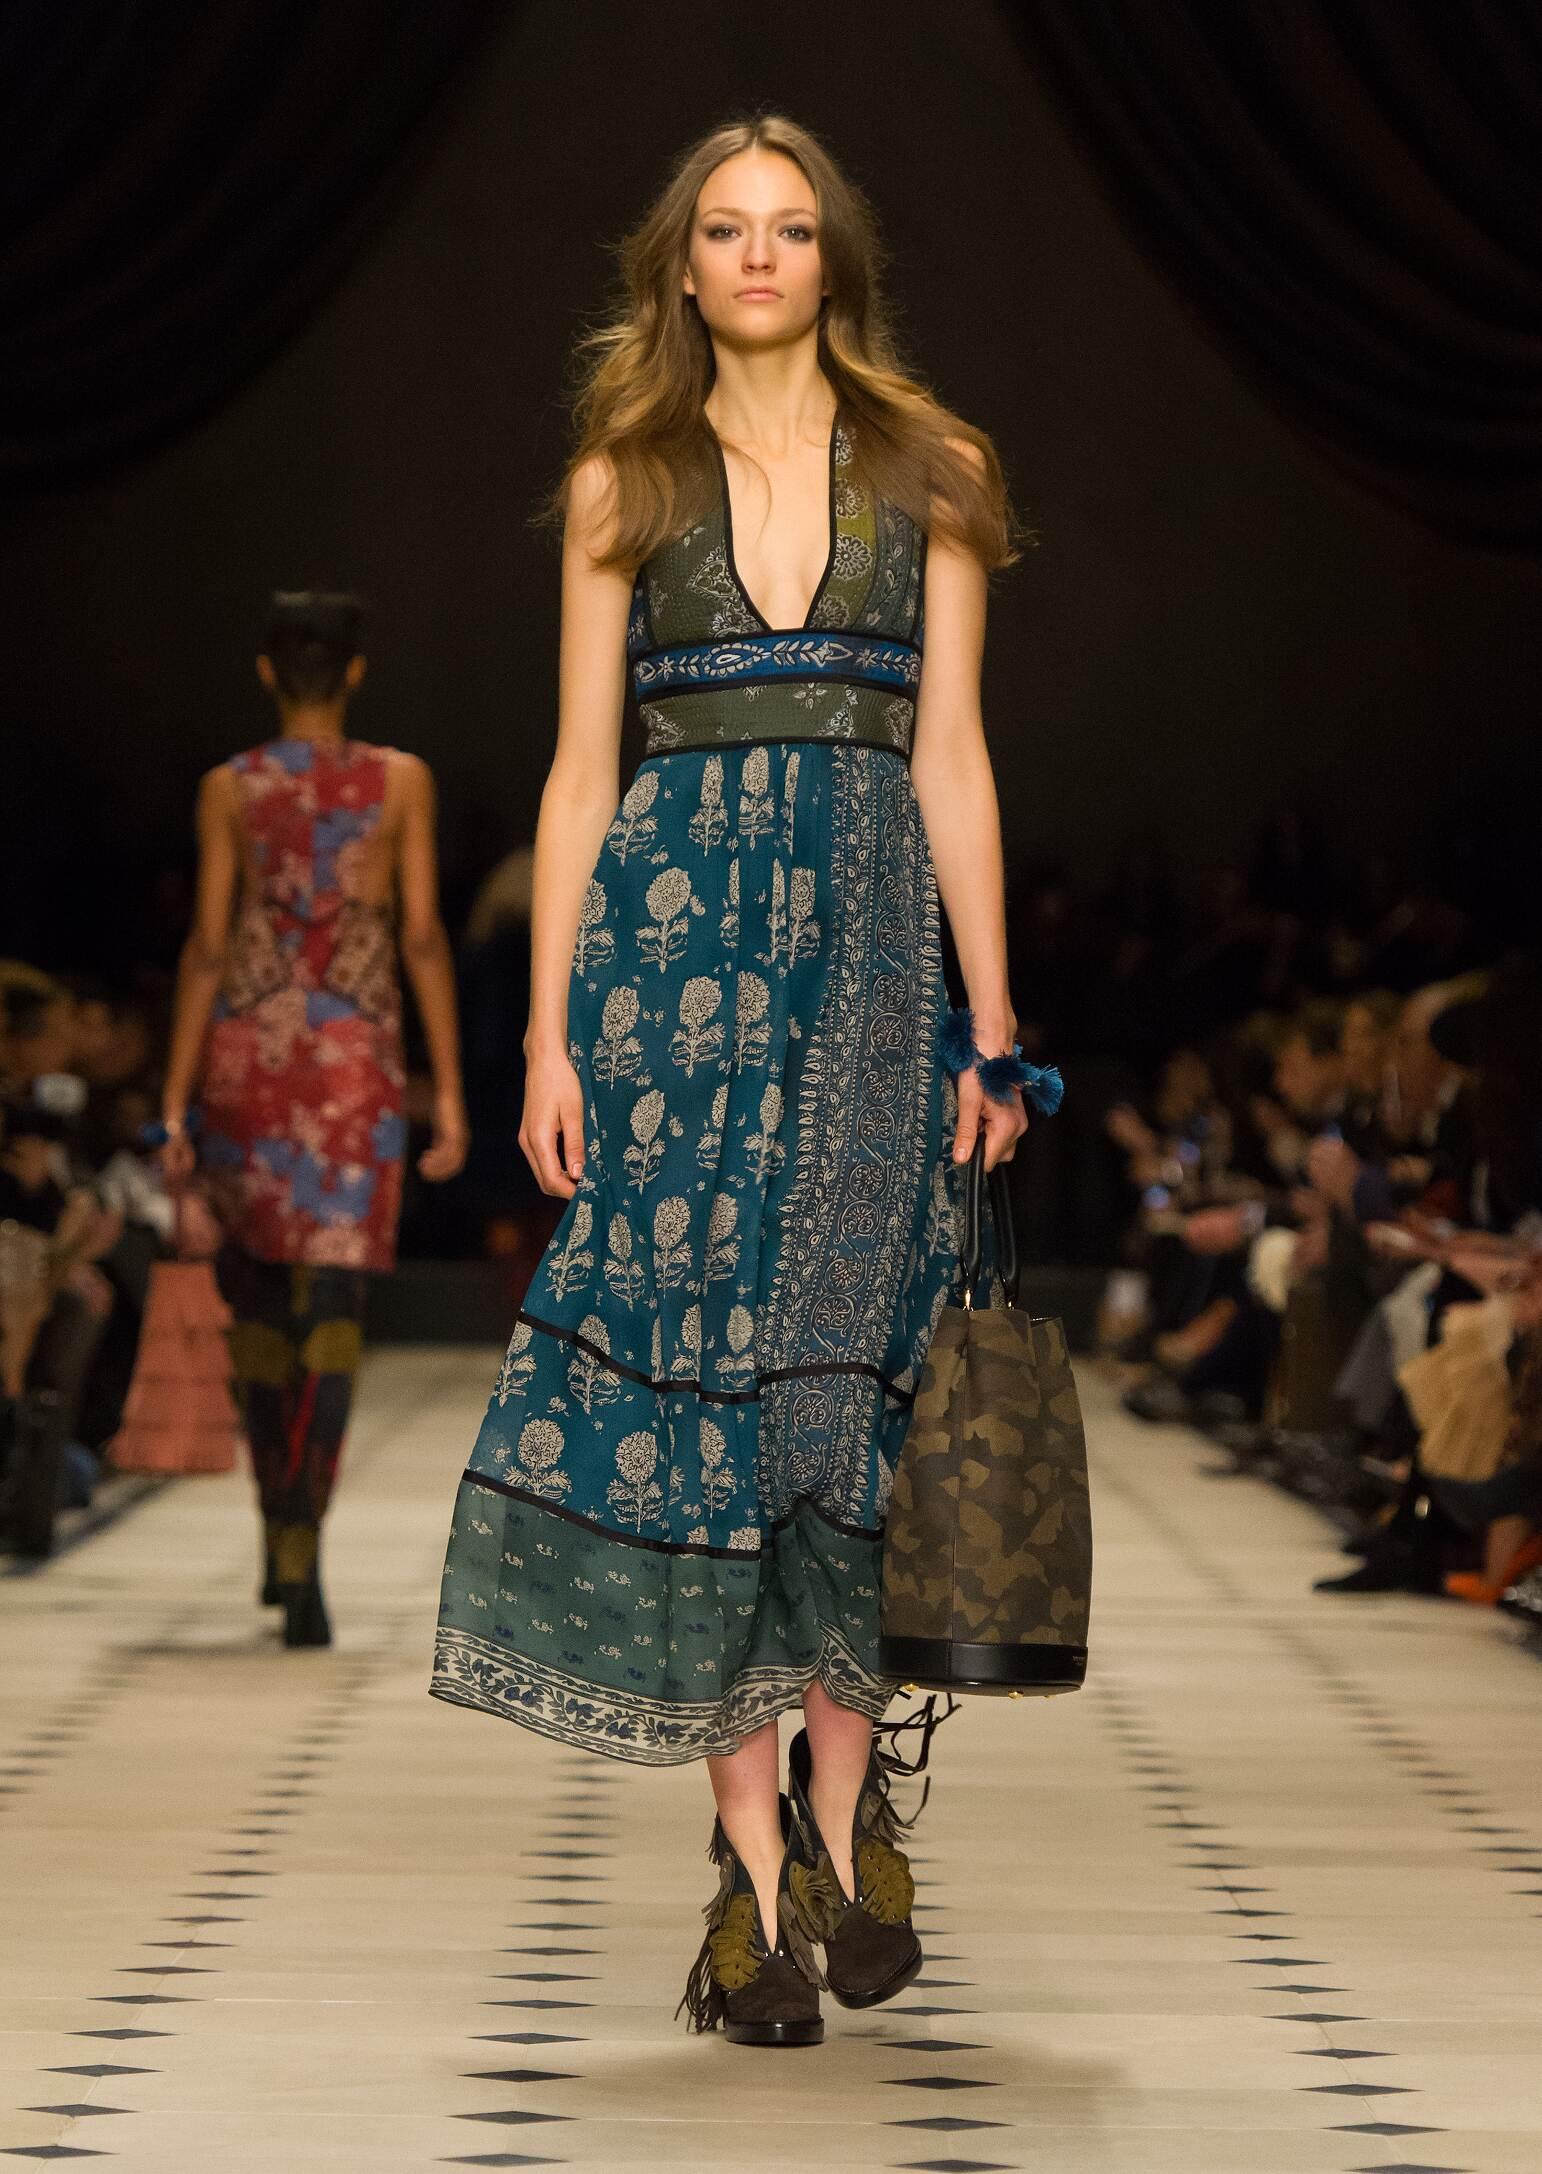 Fall 2015 Women Fashion Show Burberry Prorsum Collection